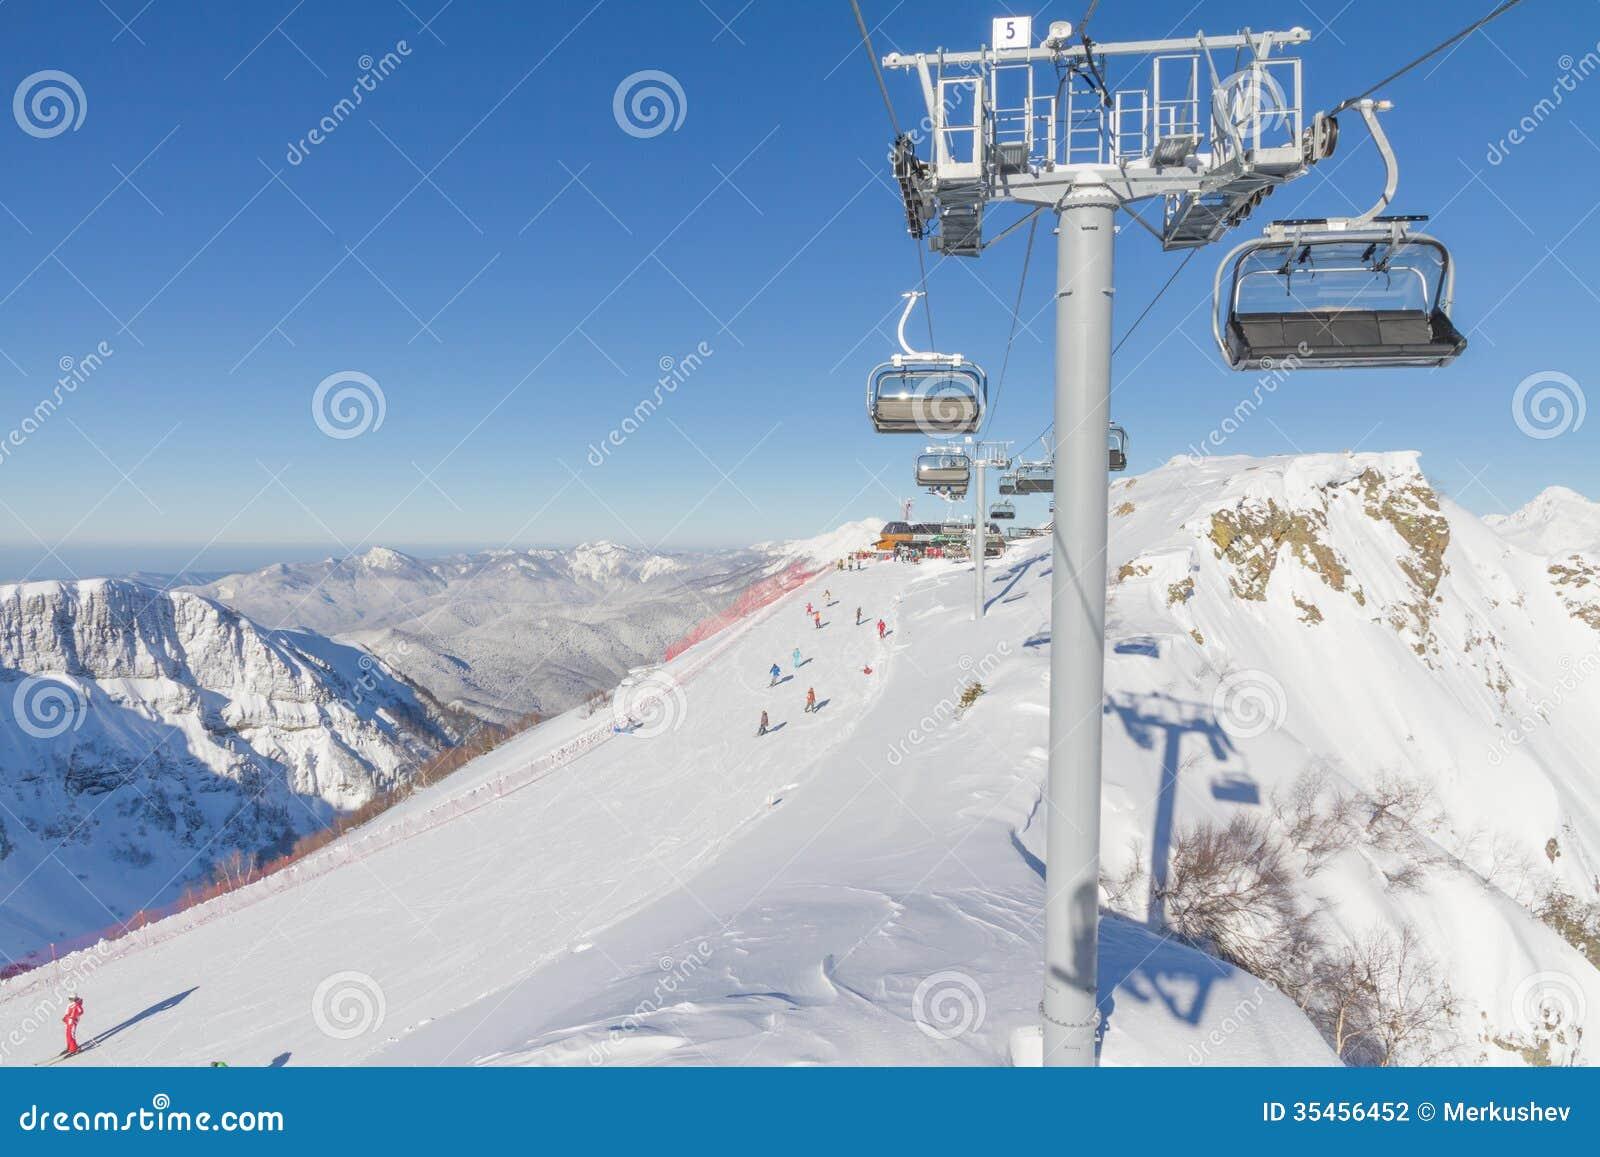 Krasnaya Polyana Russia  city photos : Chairlift in a ski resort Krasnaya Polyana. Sochi, Russia.